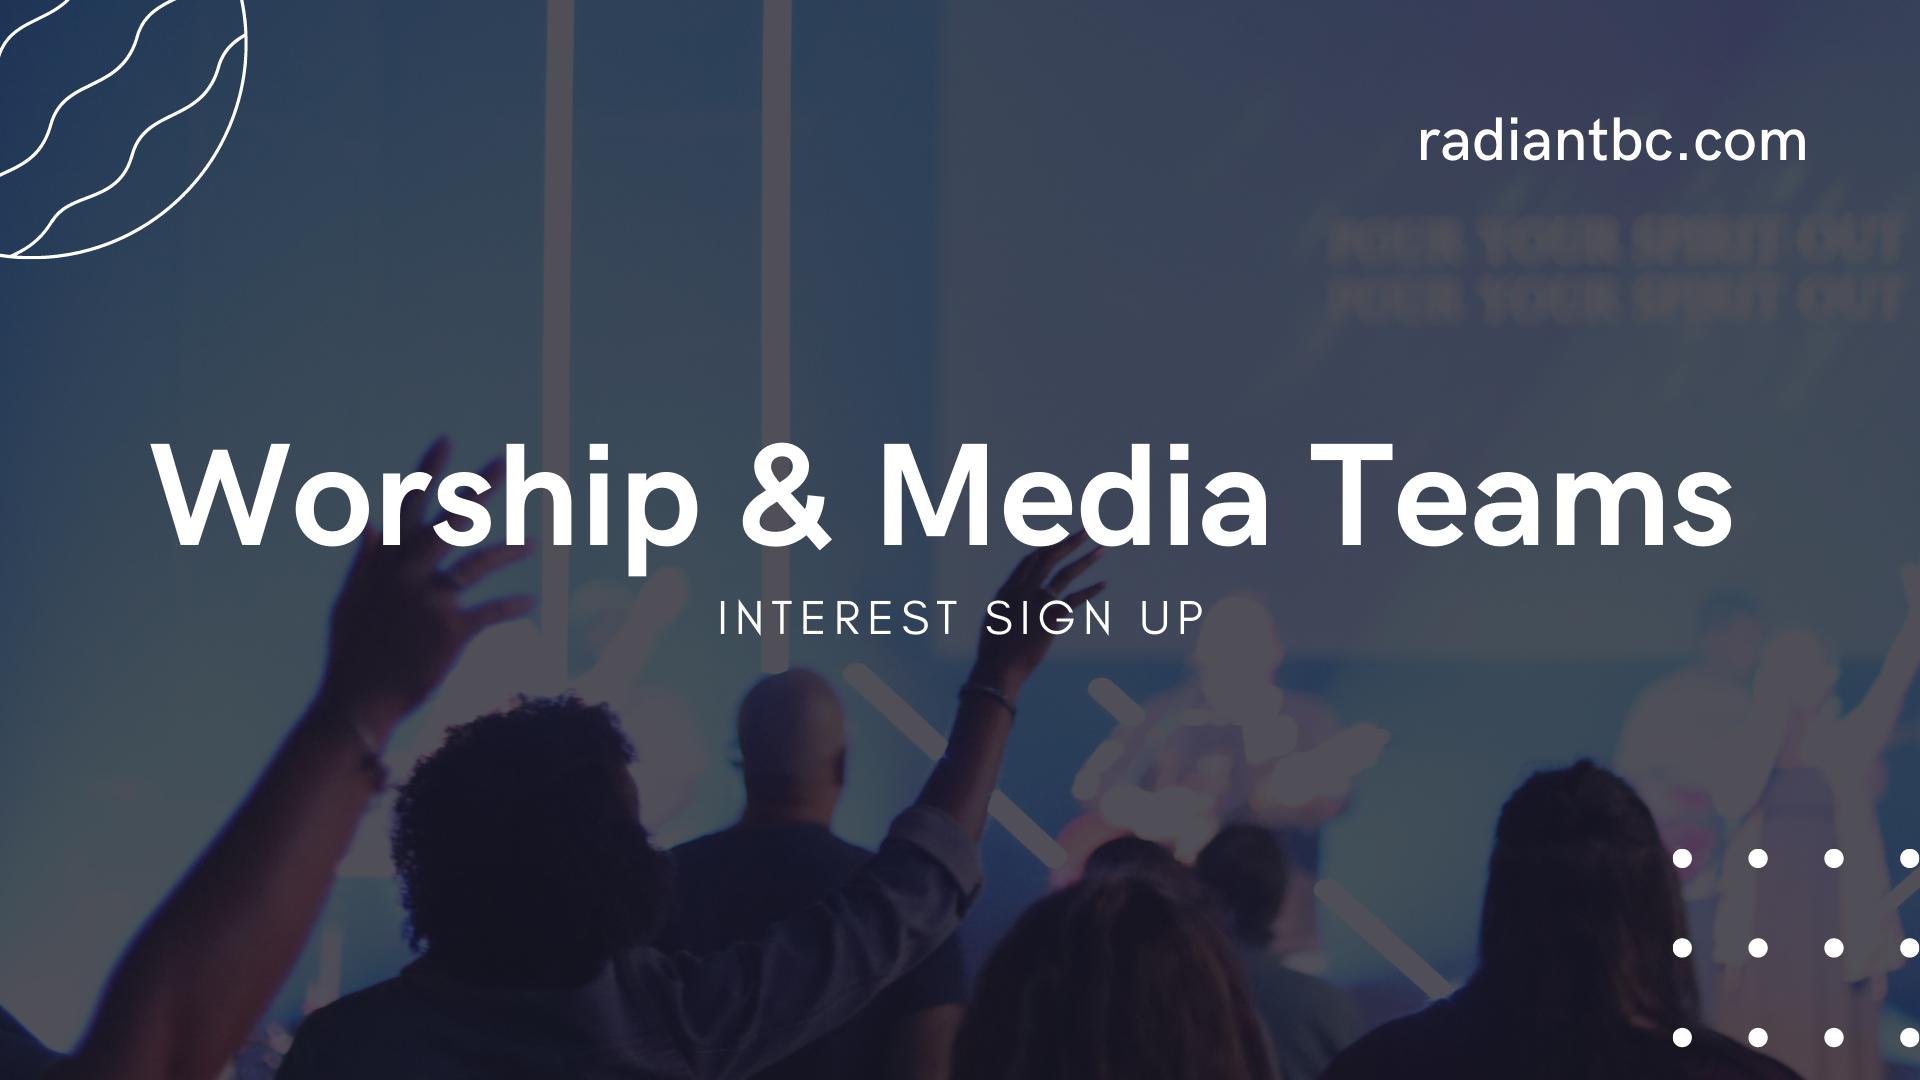 Worship & Media Teams Interest